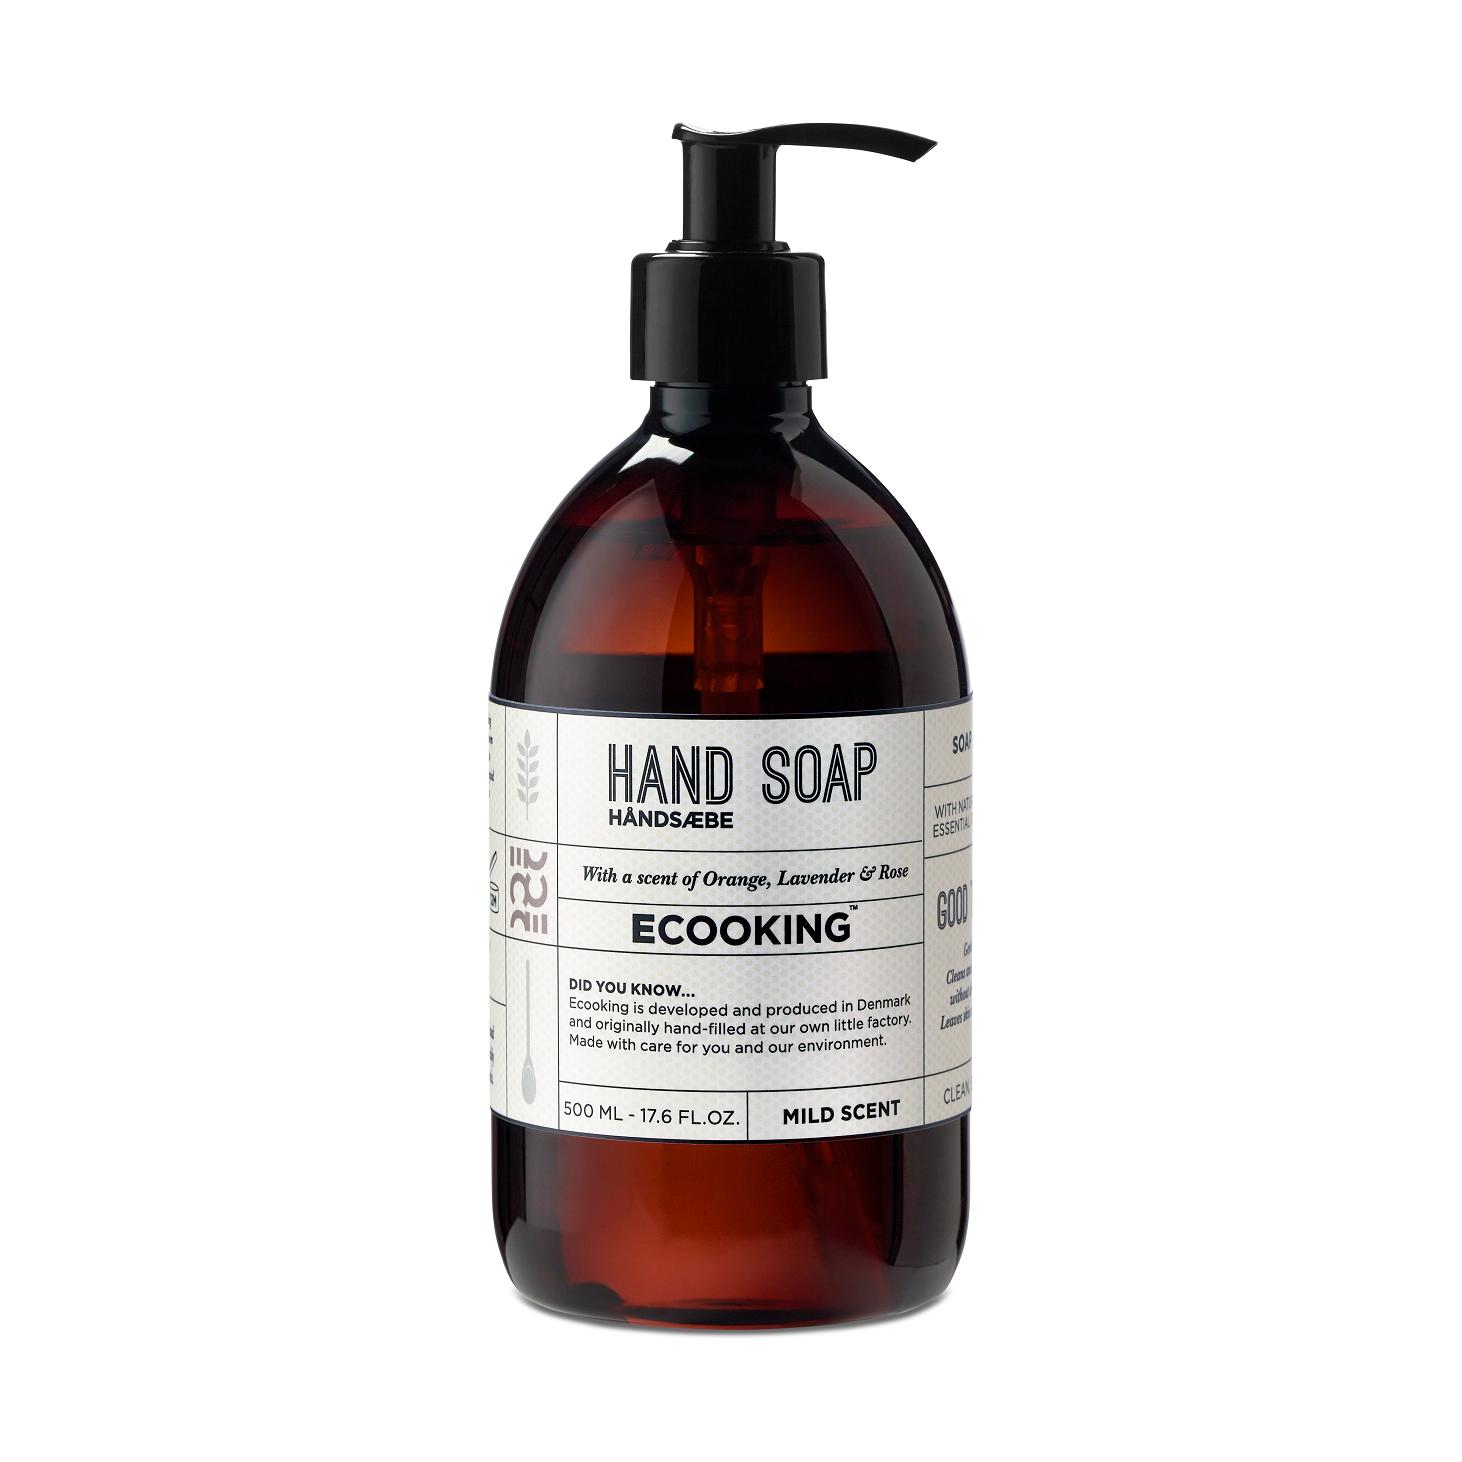 Ecooking - Handseife 500 ml